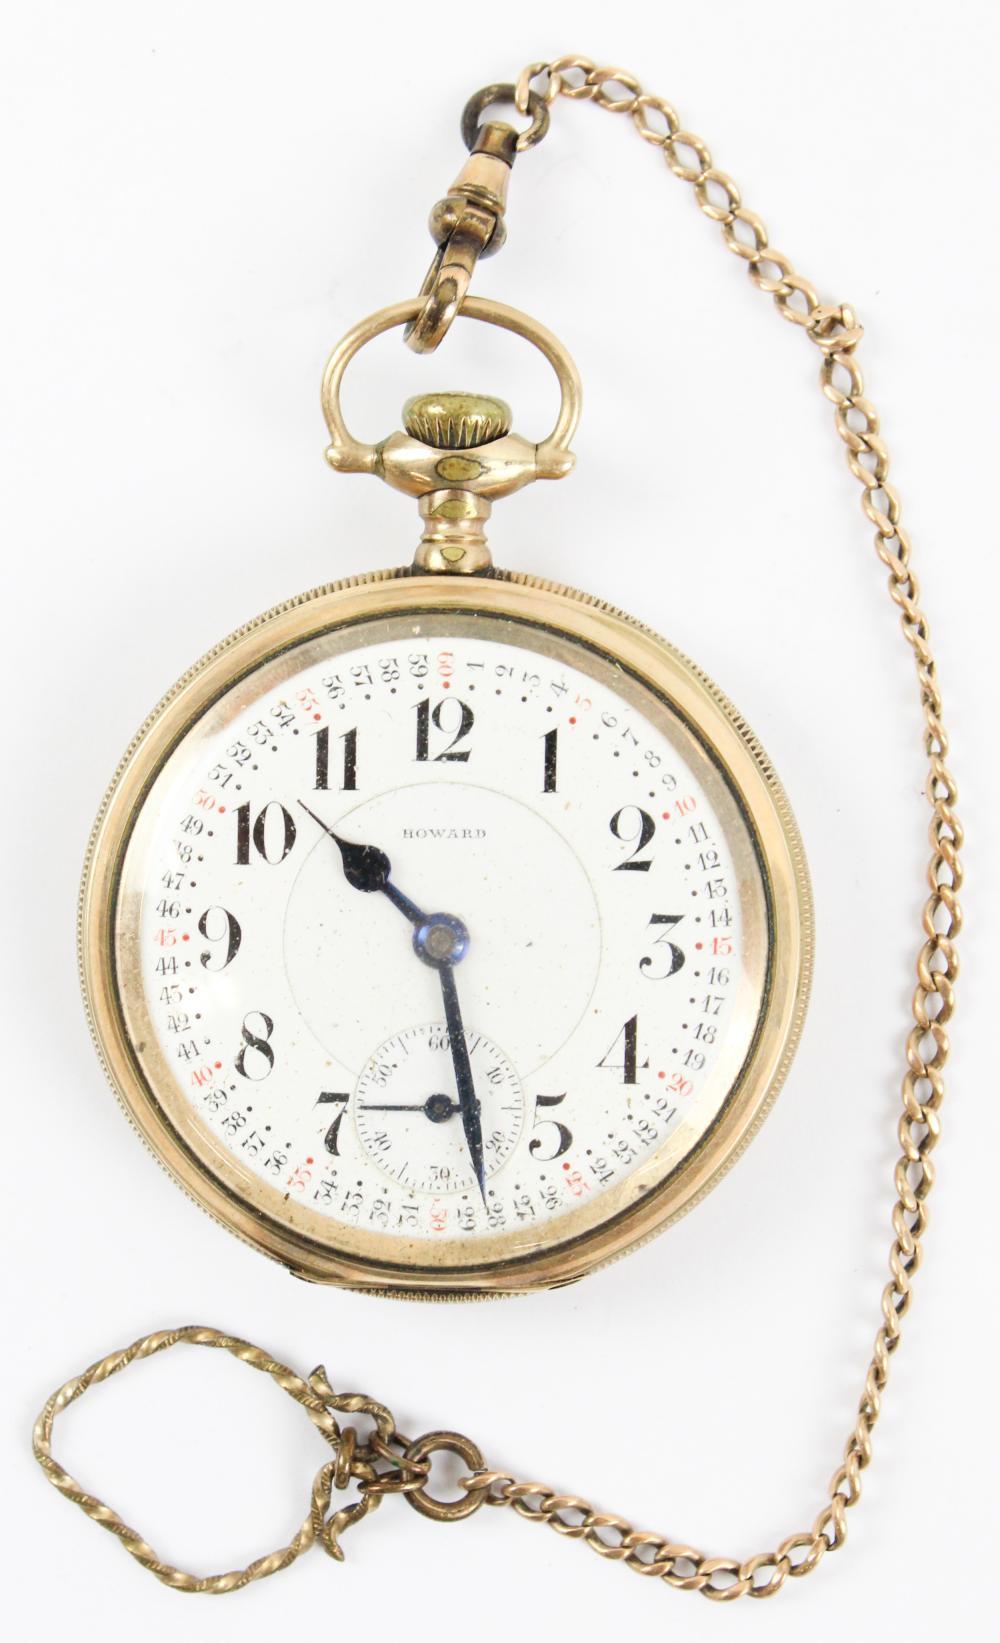 Howard 21 Jewel Pocket Watch